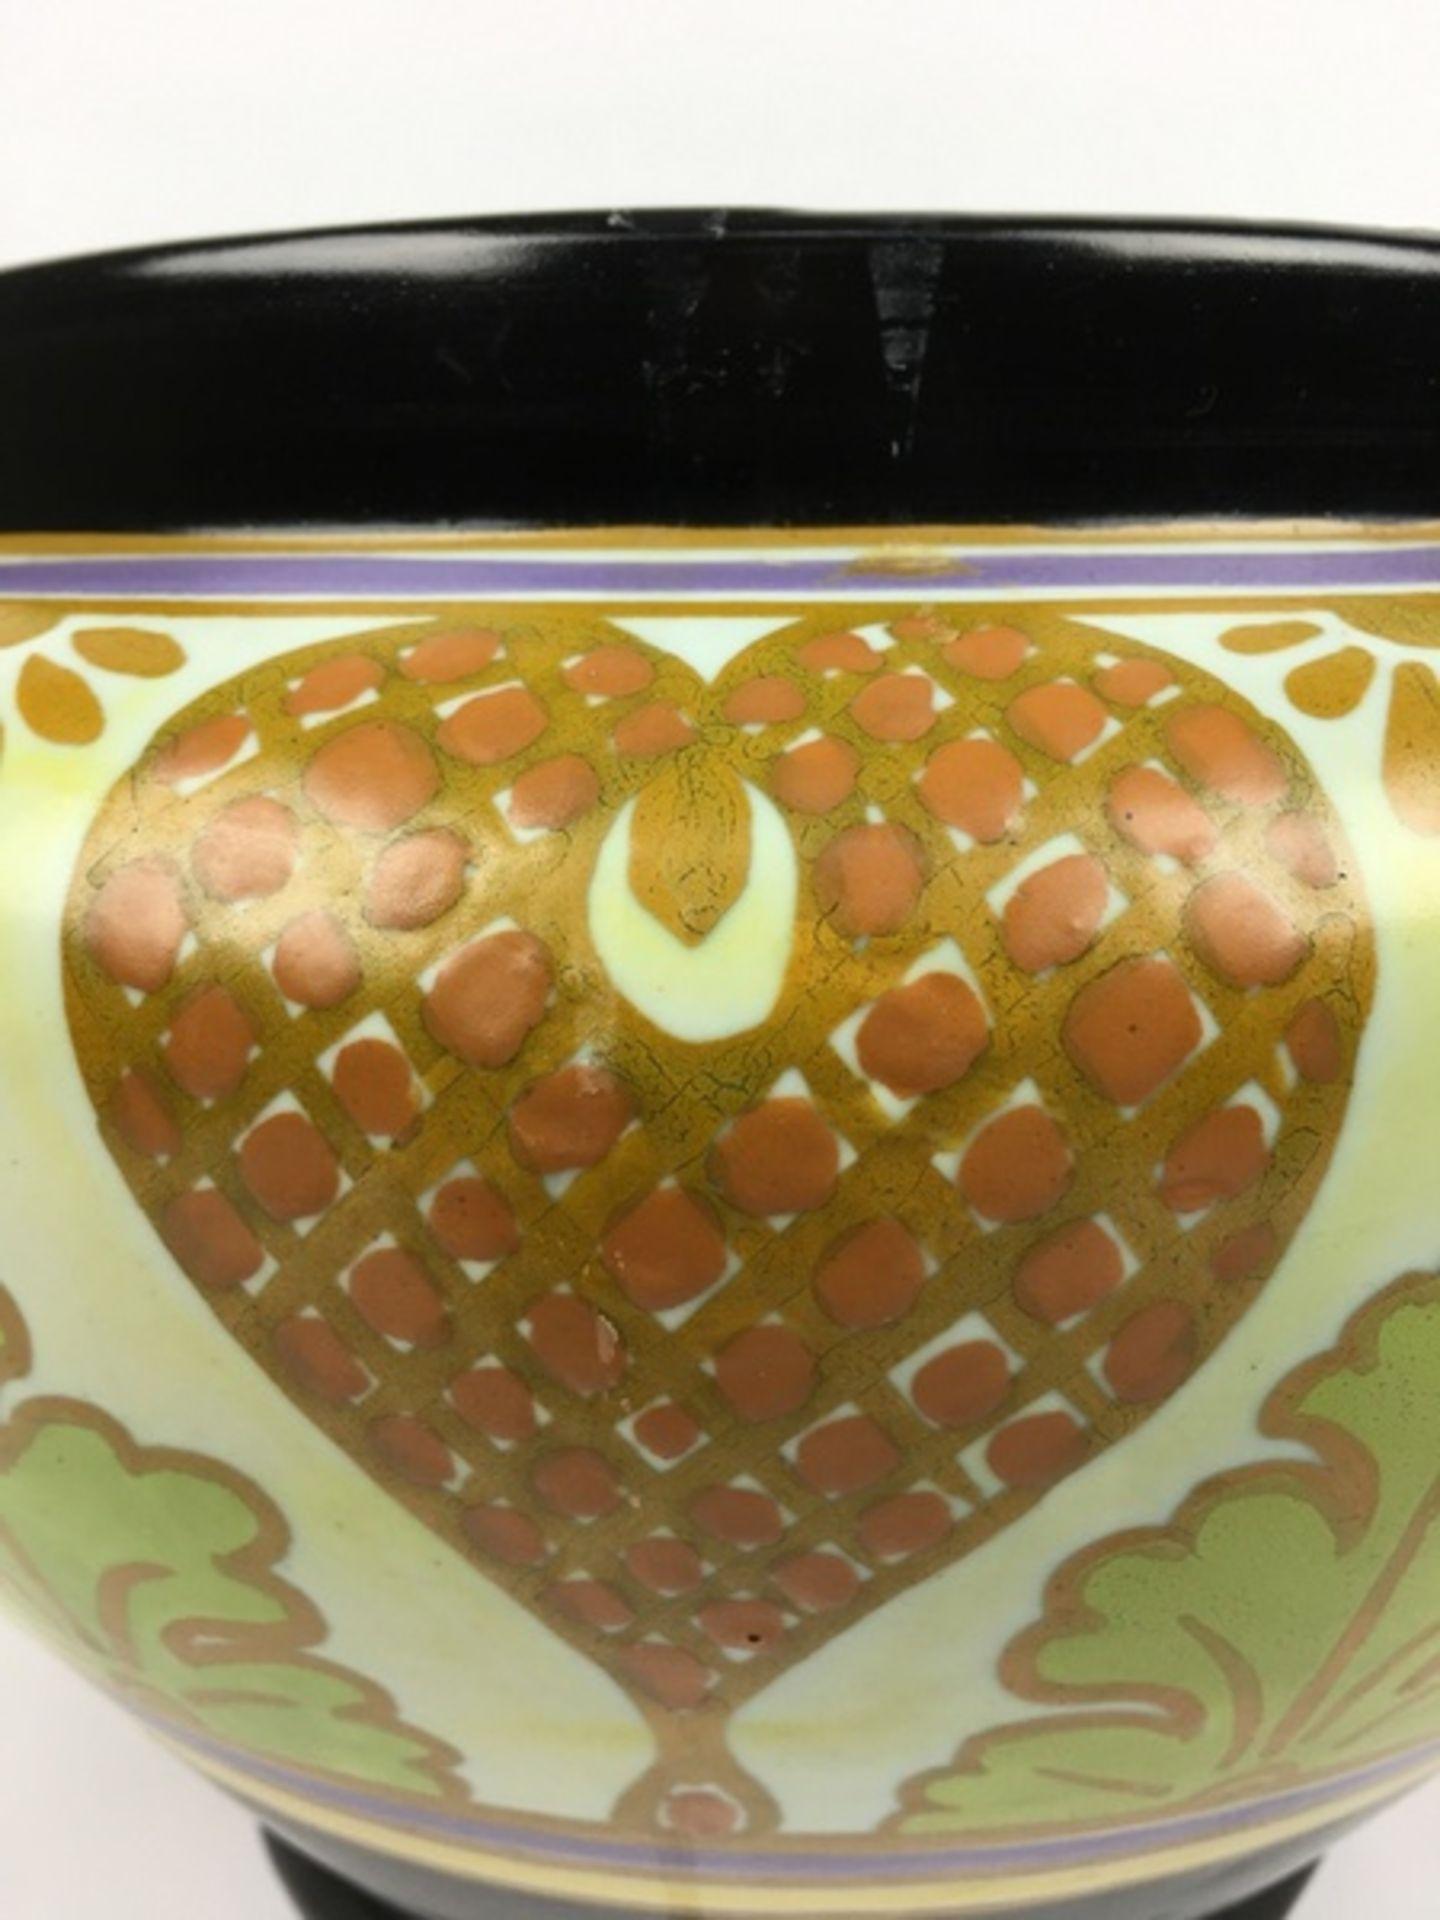 (Toegpaste kunst) Plateel bloempot, Gouda HollandAmfora plateel bloempot, decor Iris. Gouda Hol - Image 7 of 9